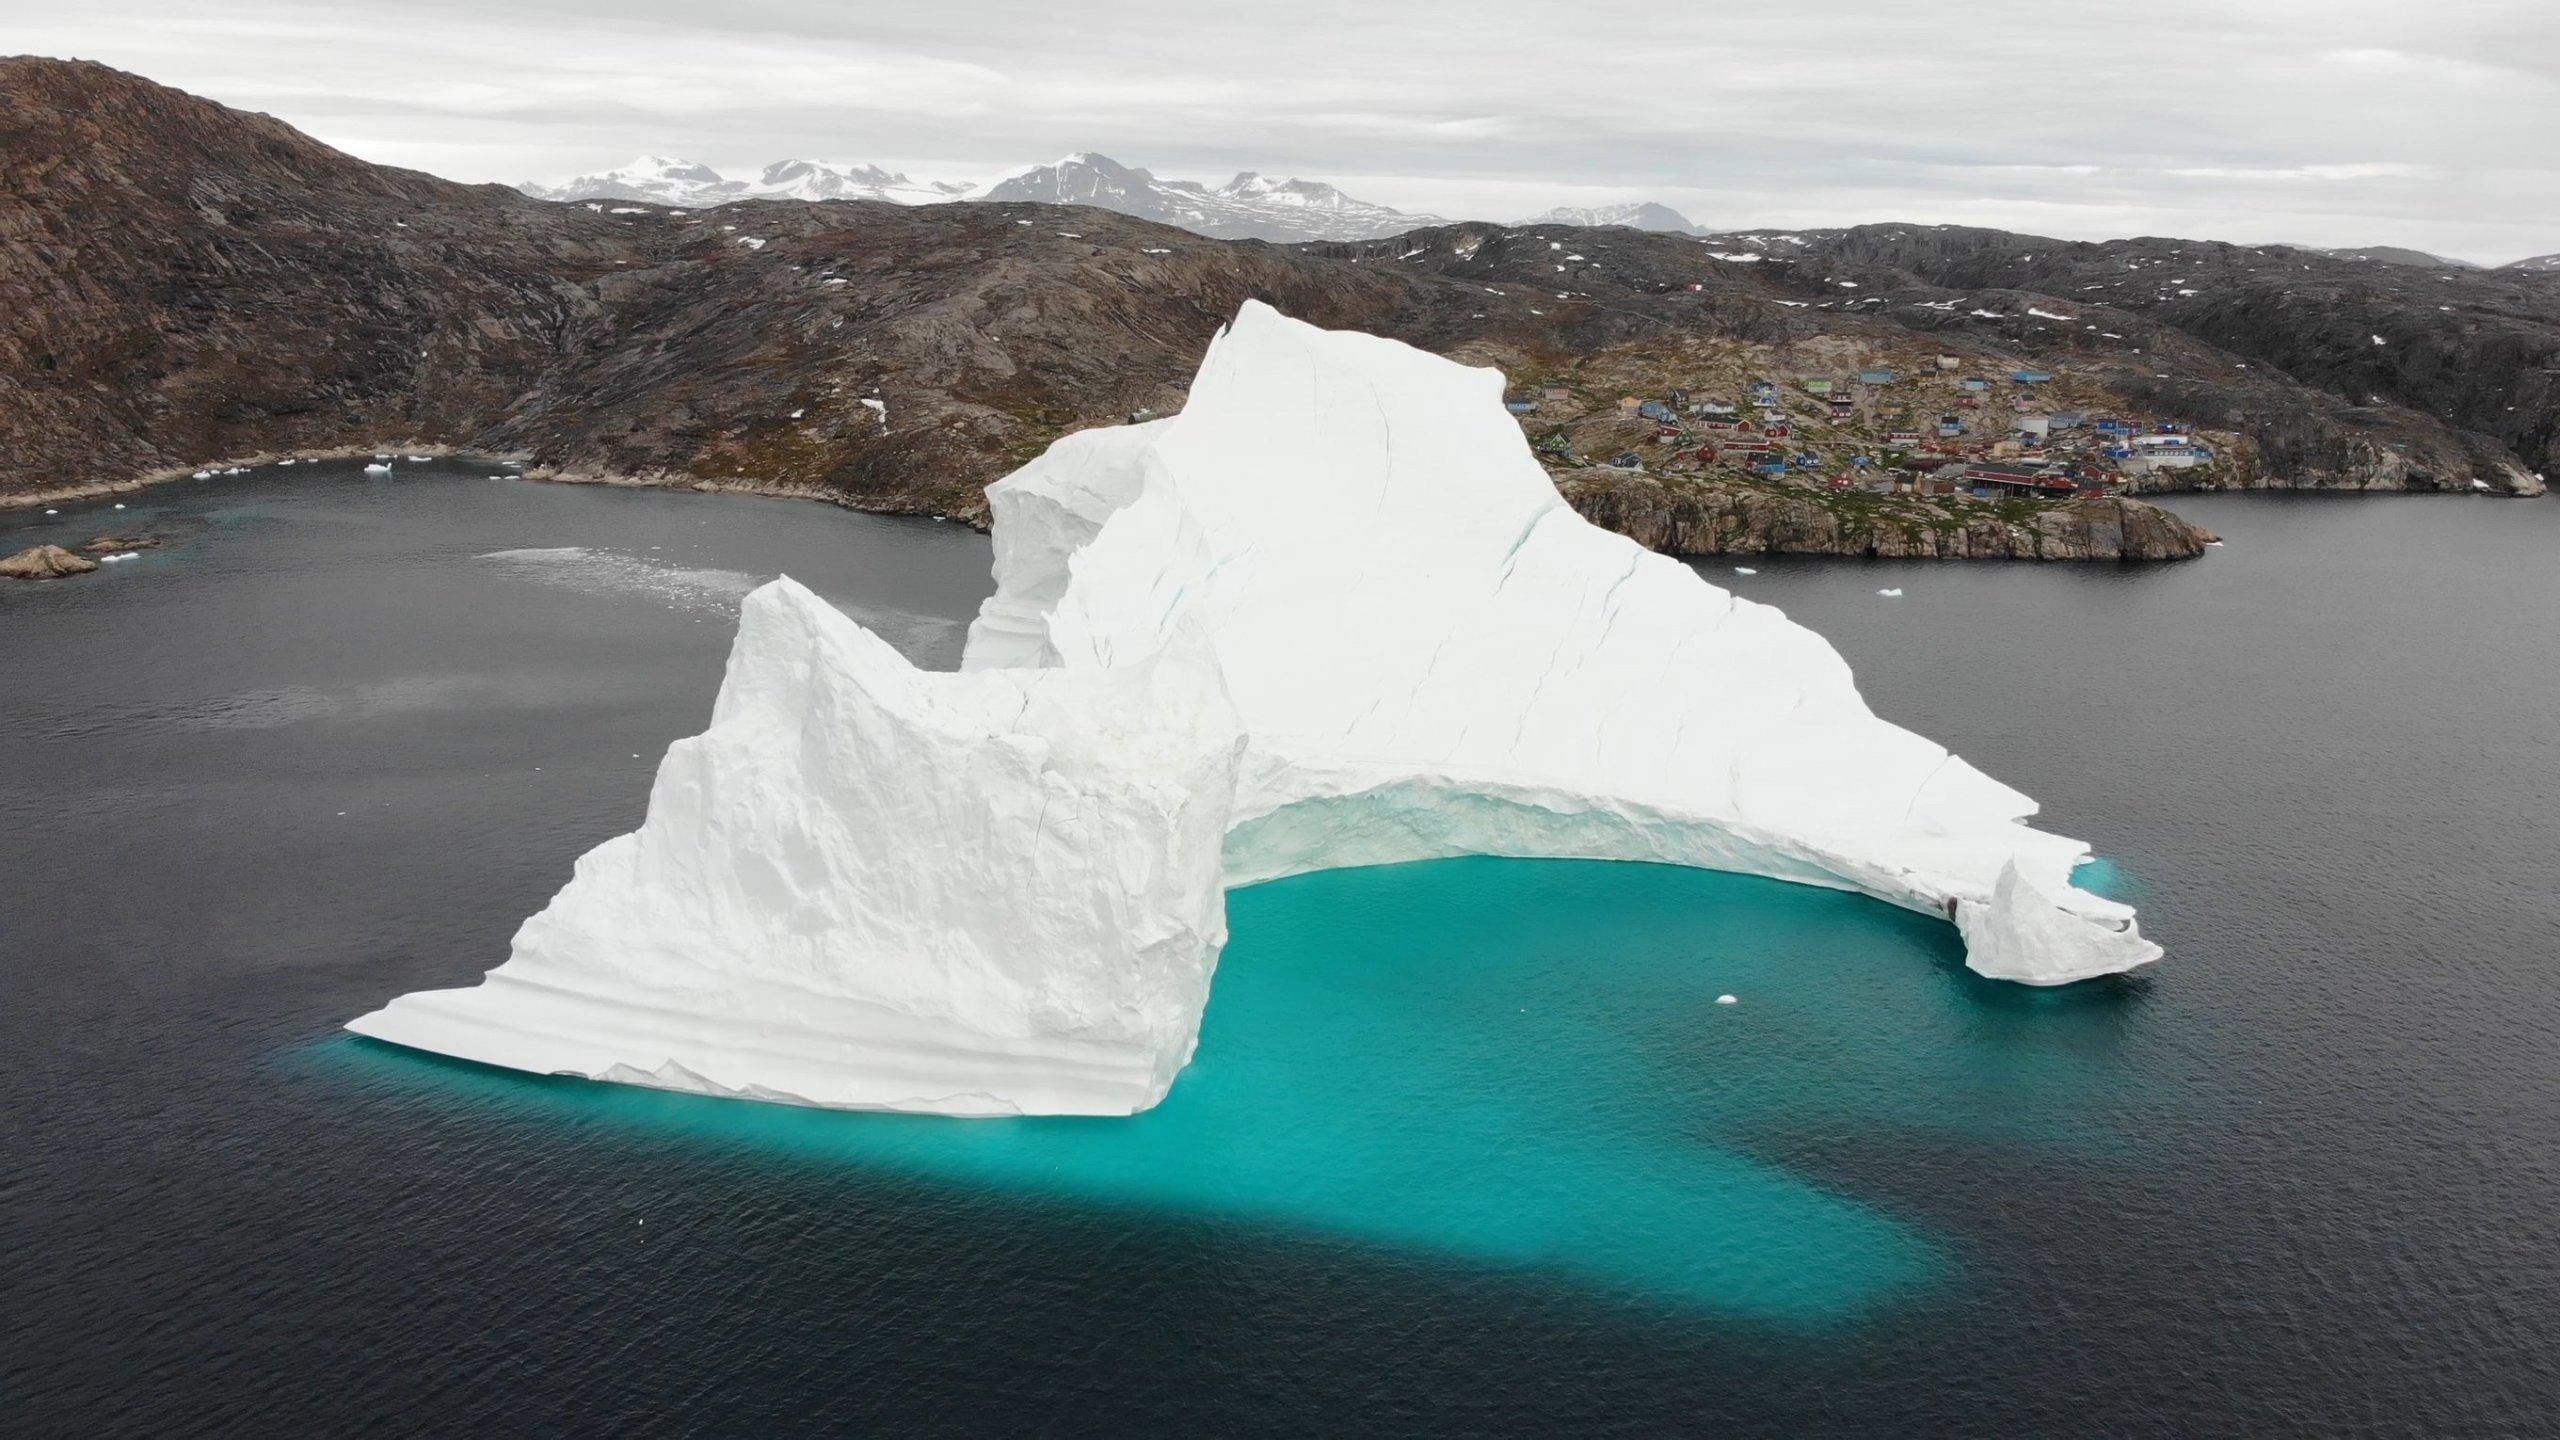 An 11-million-ton iceberg is threatening the isolated fishing village of Innaarsuit, Greenland. (Credit: CNN)